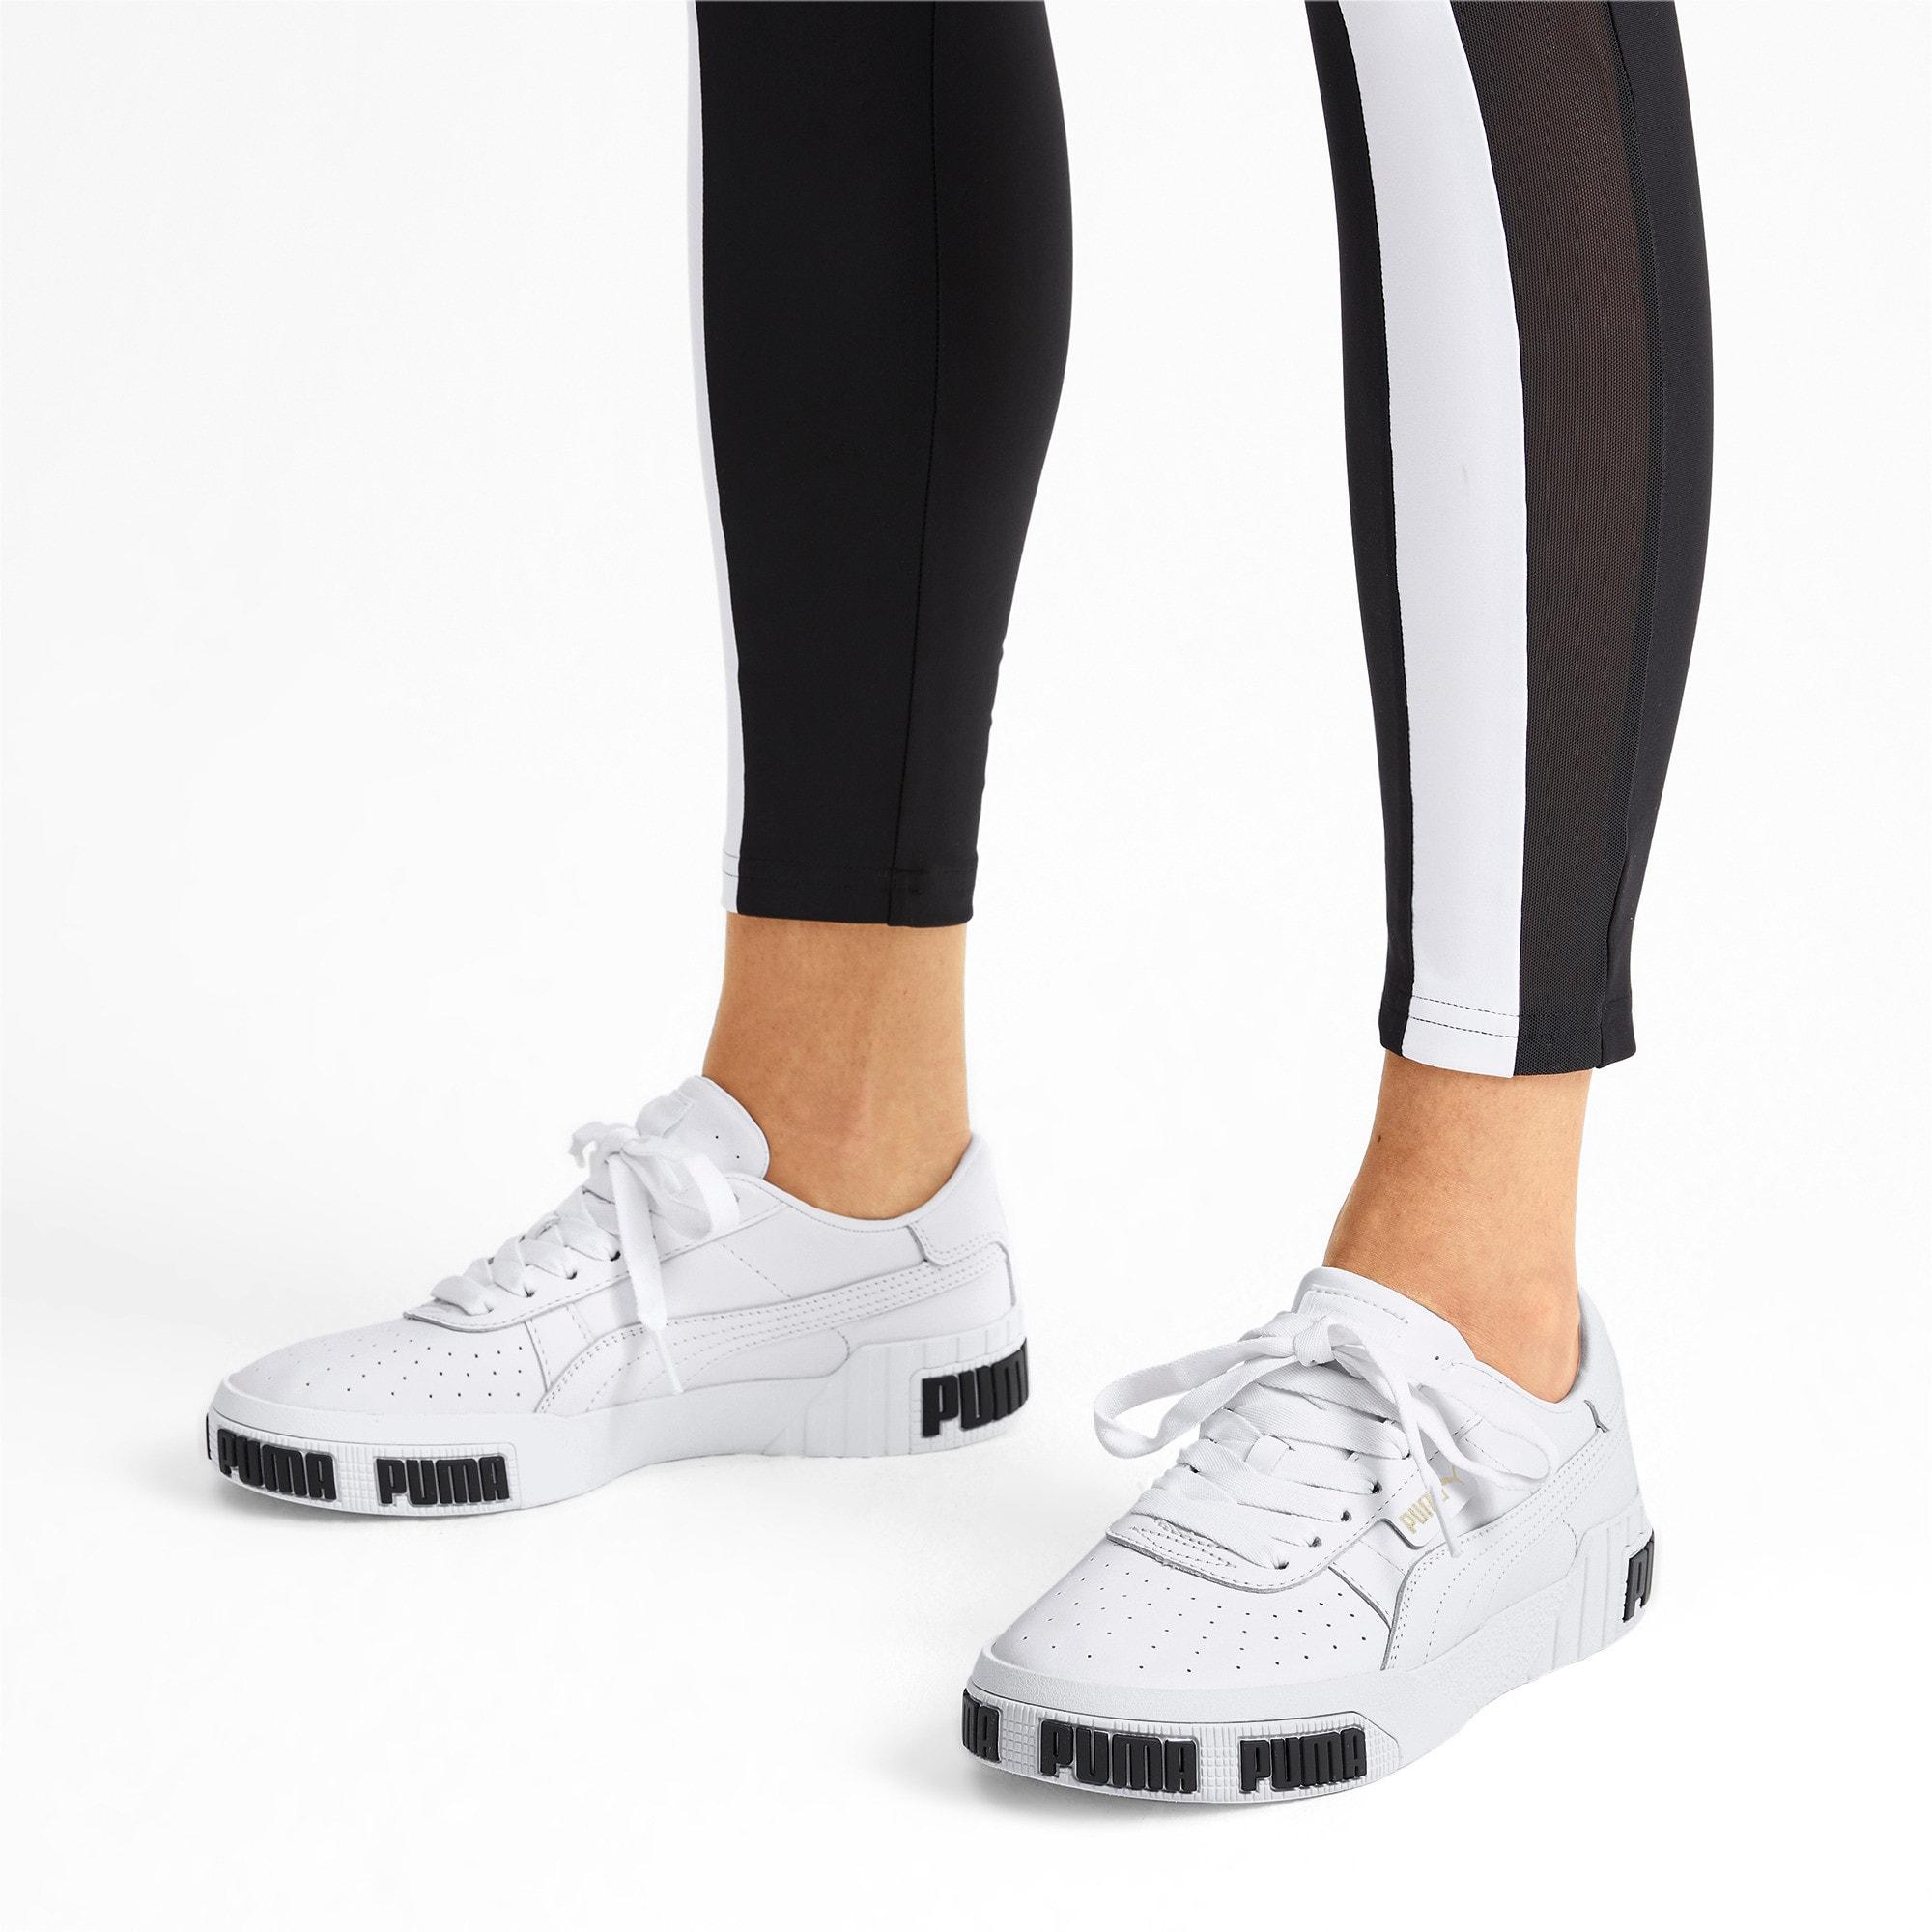 Thumbnail 2 of Cali Bold Women's Sneakers, Puma White-Metallic Gold, medium